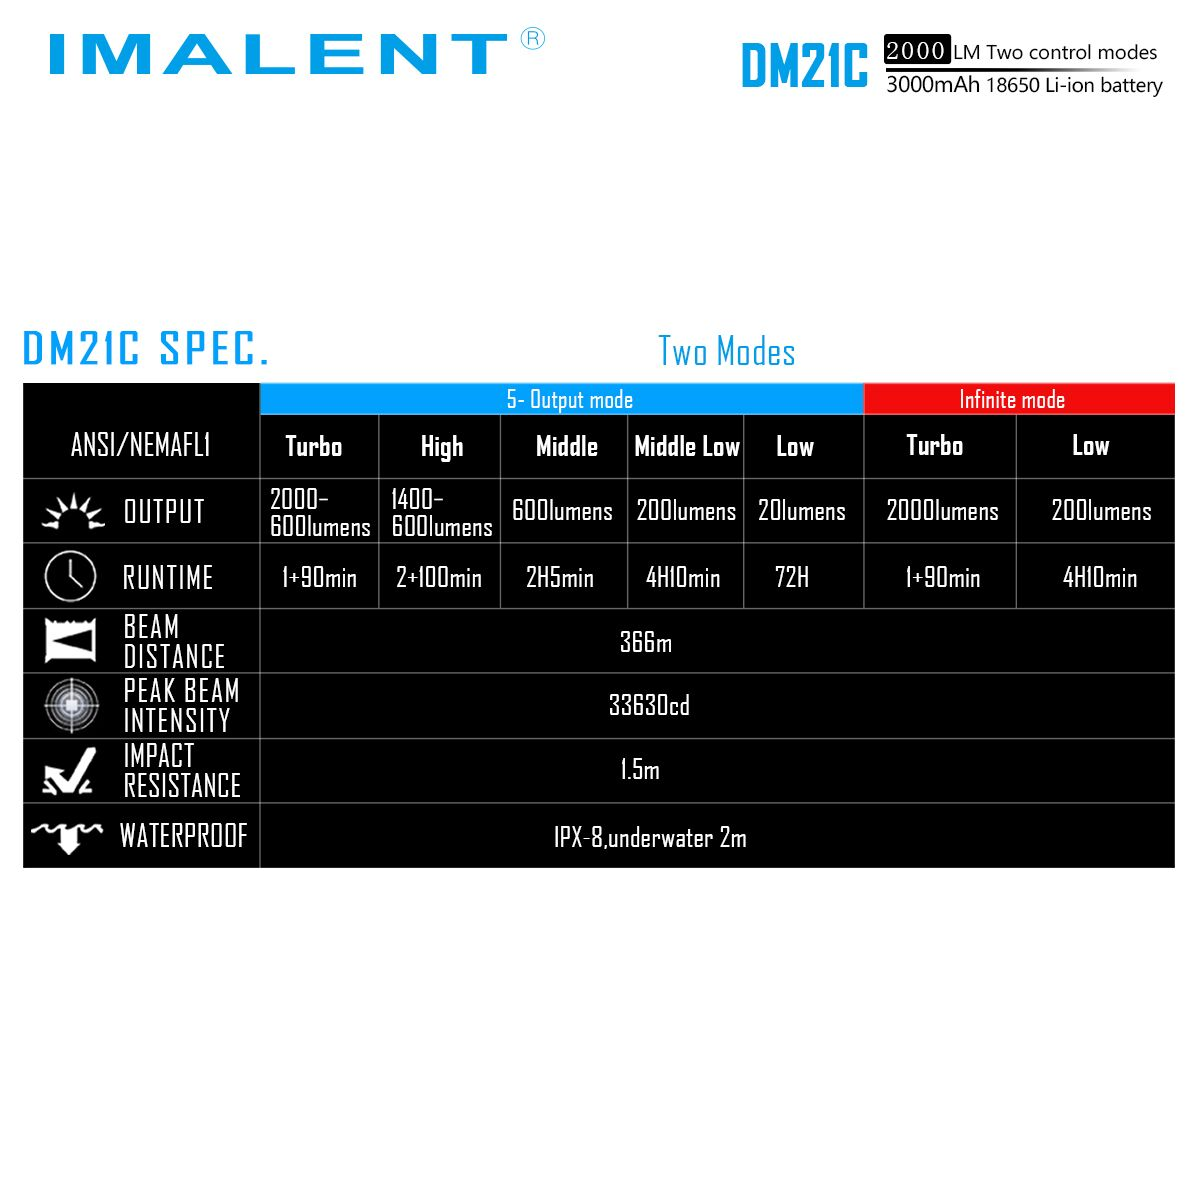 DM21C POTENTE IMALENT